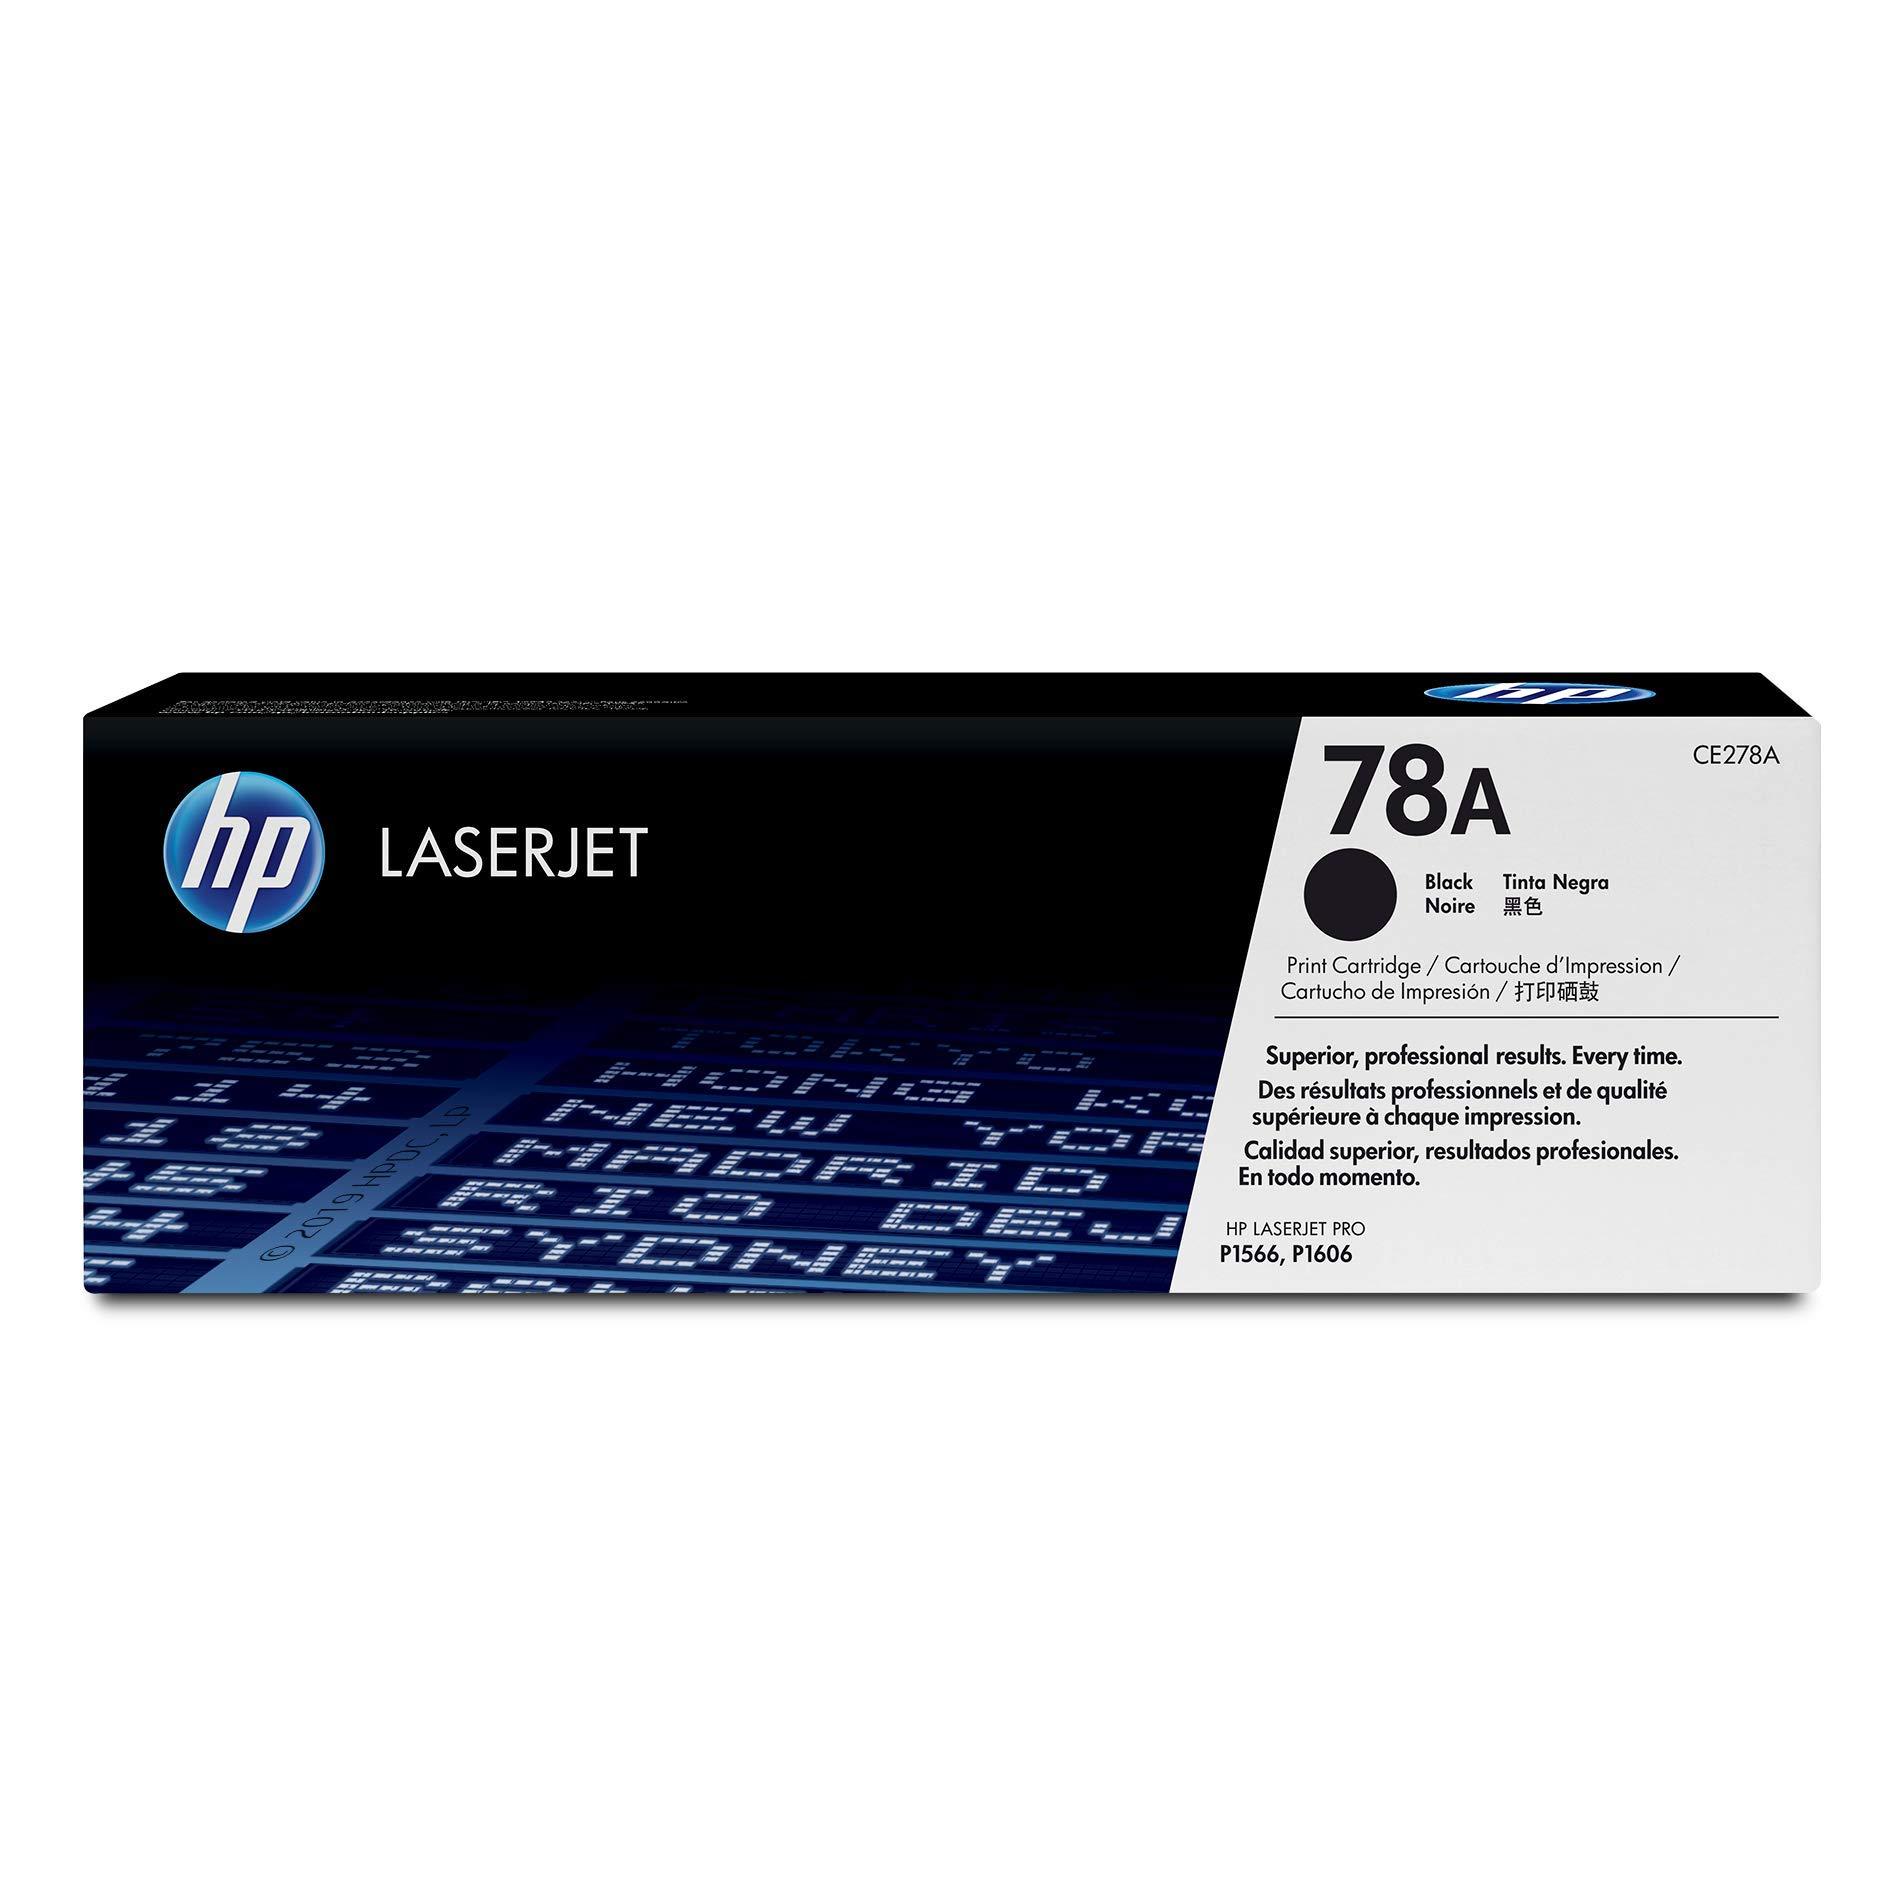 HP 78A   CE278A   Toner Cartridge   Black by HP